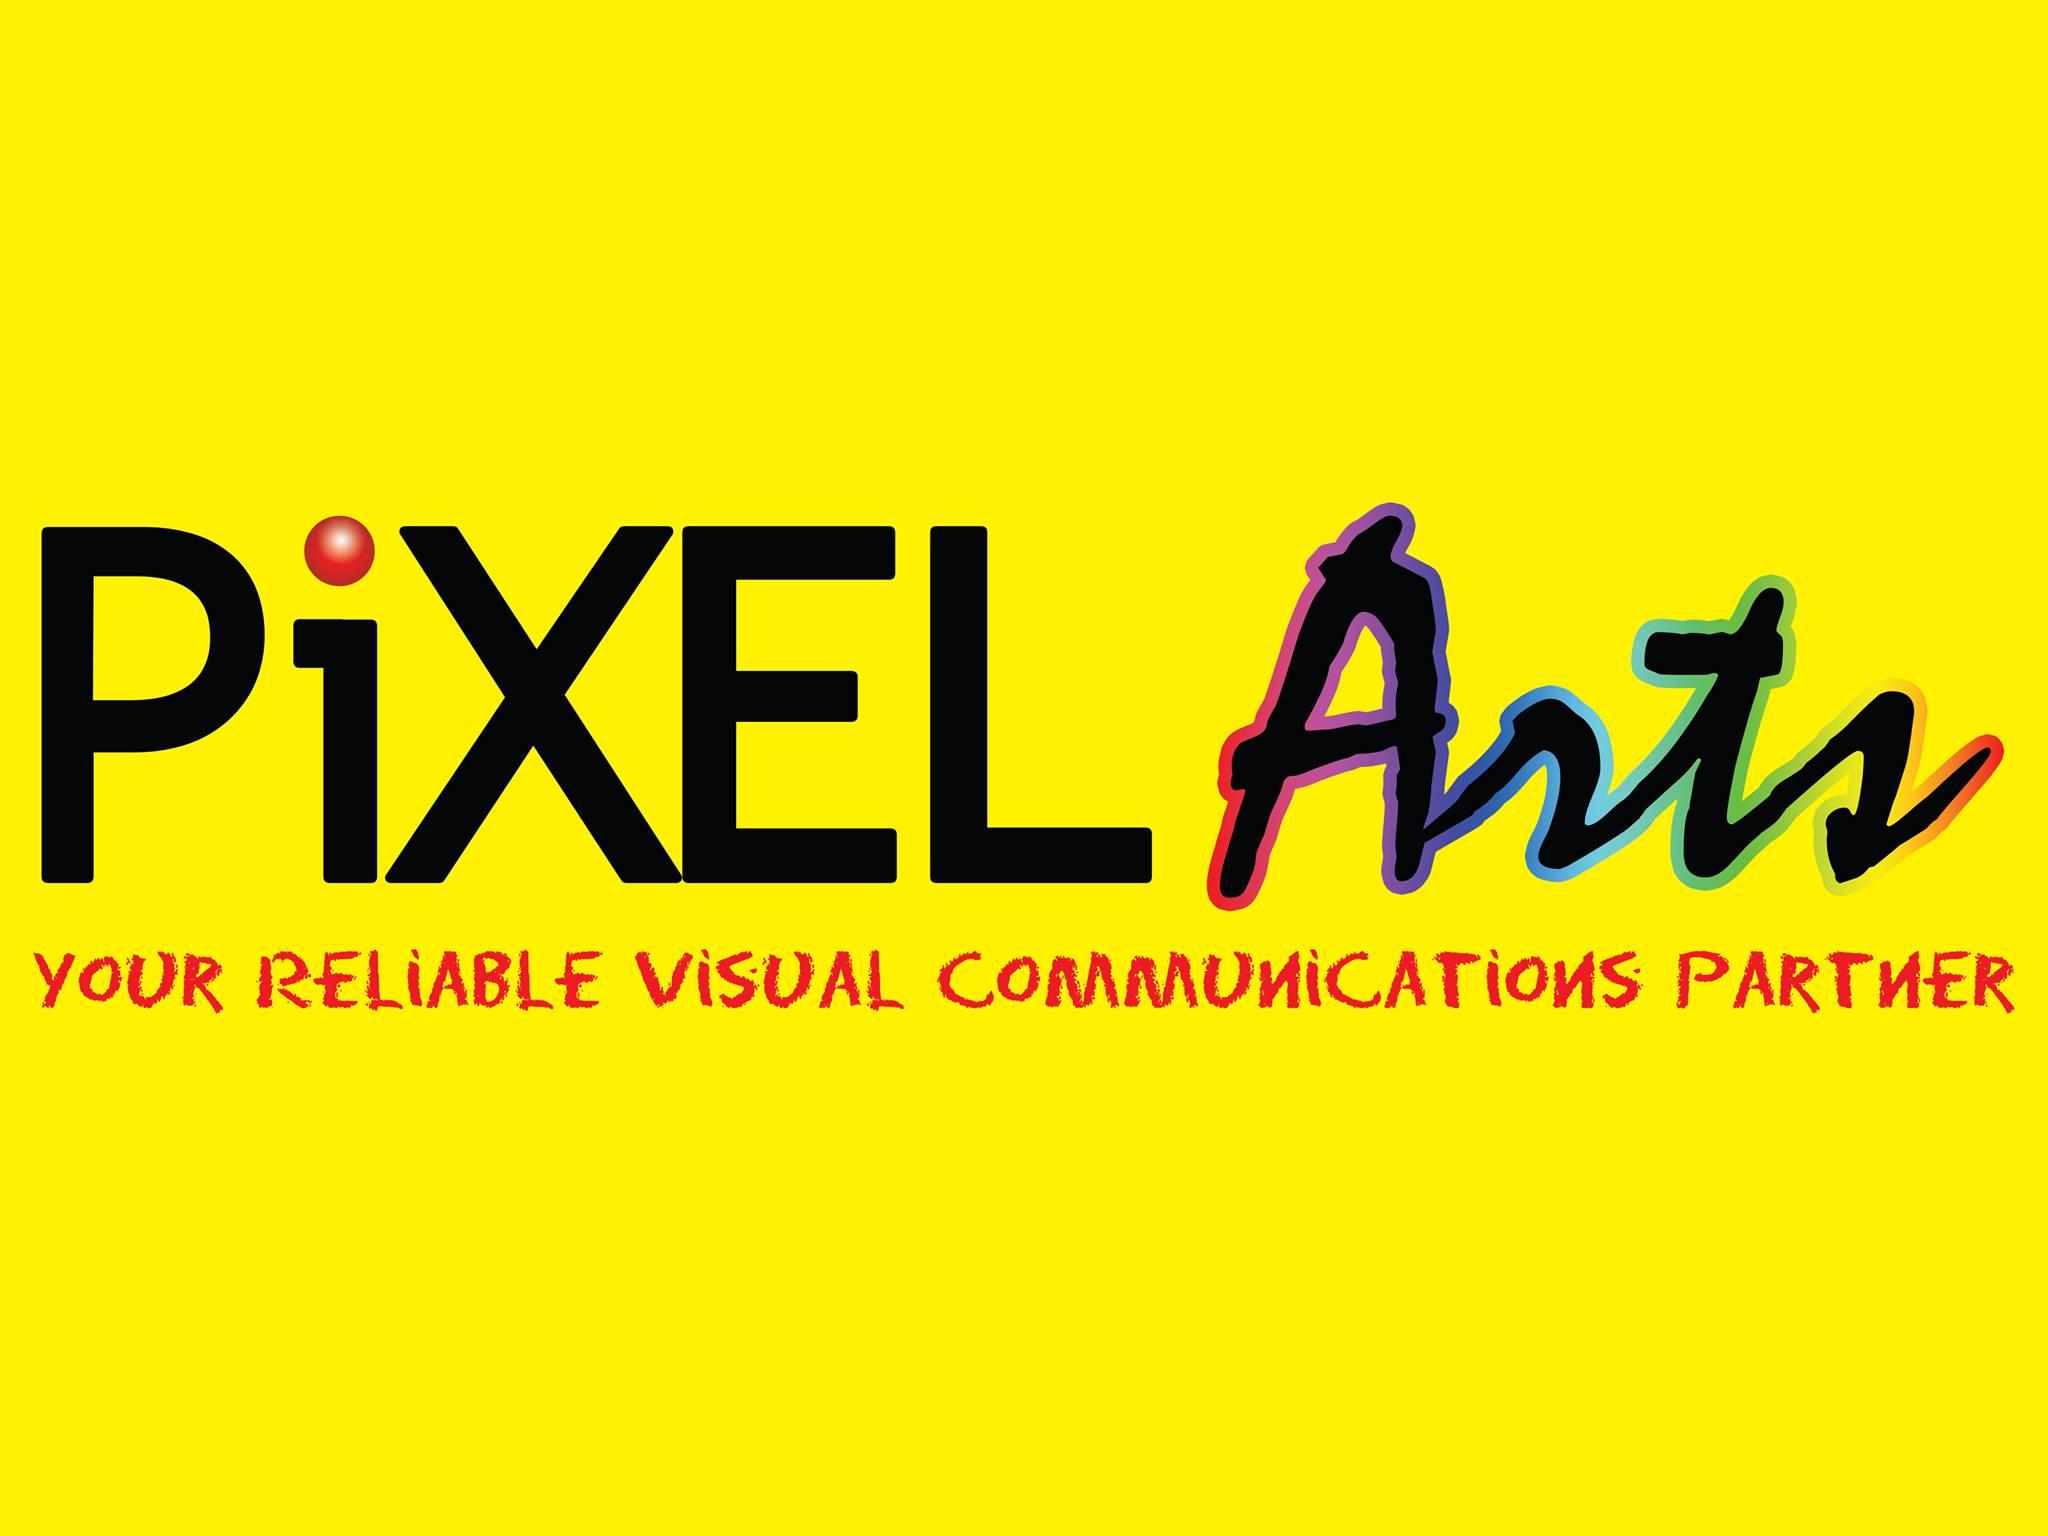 Pixle arts